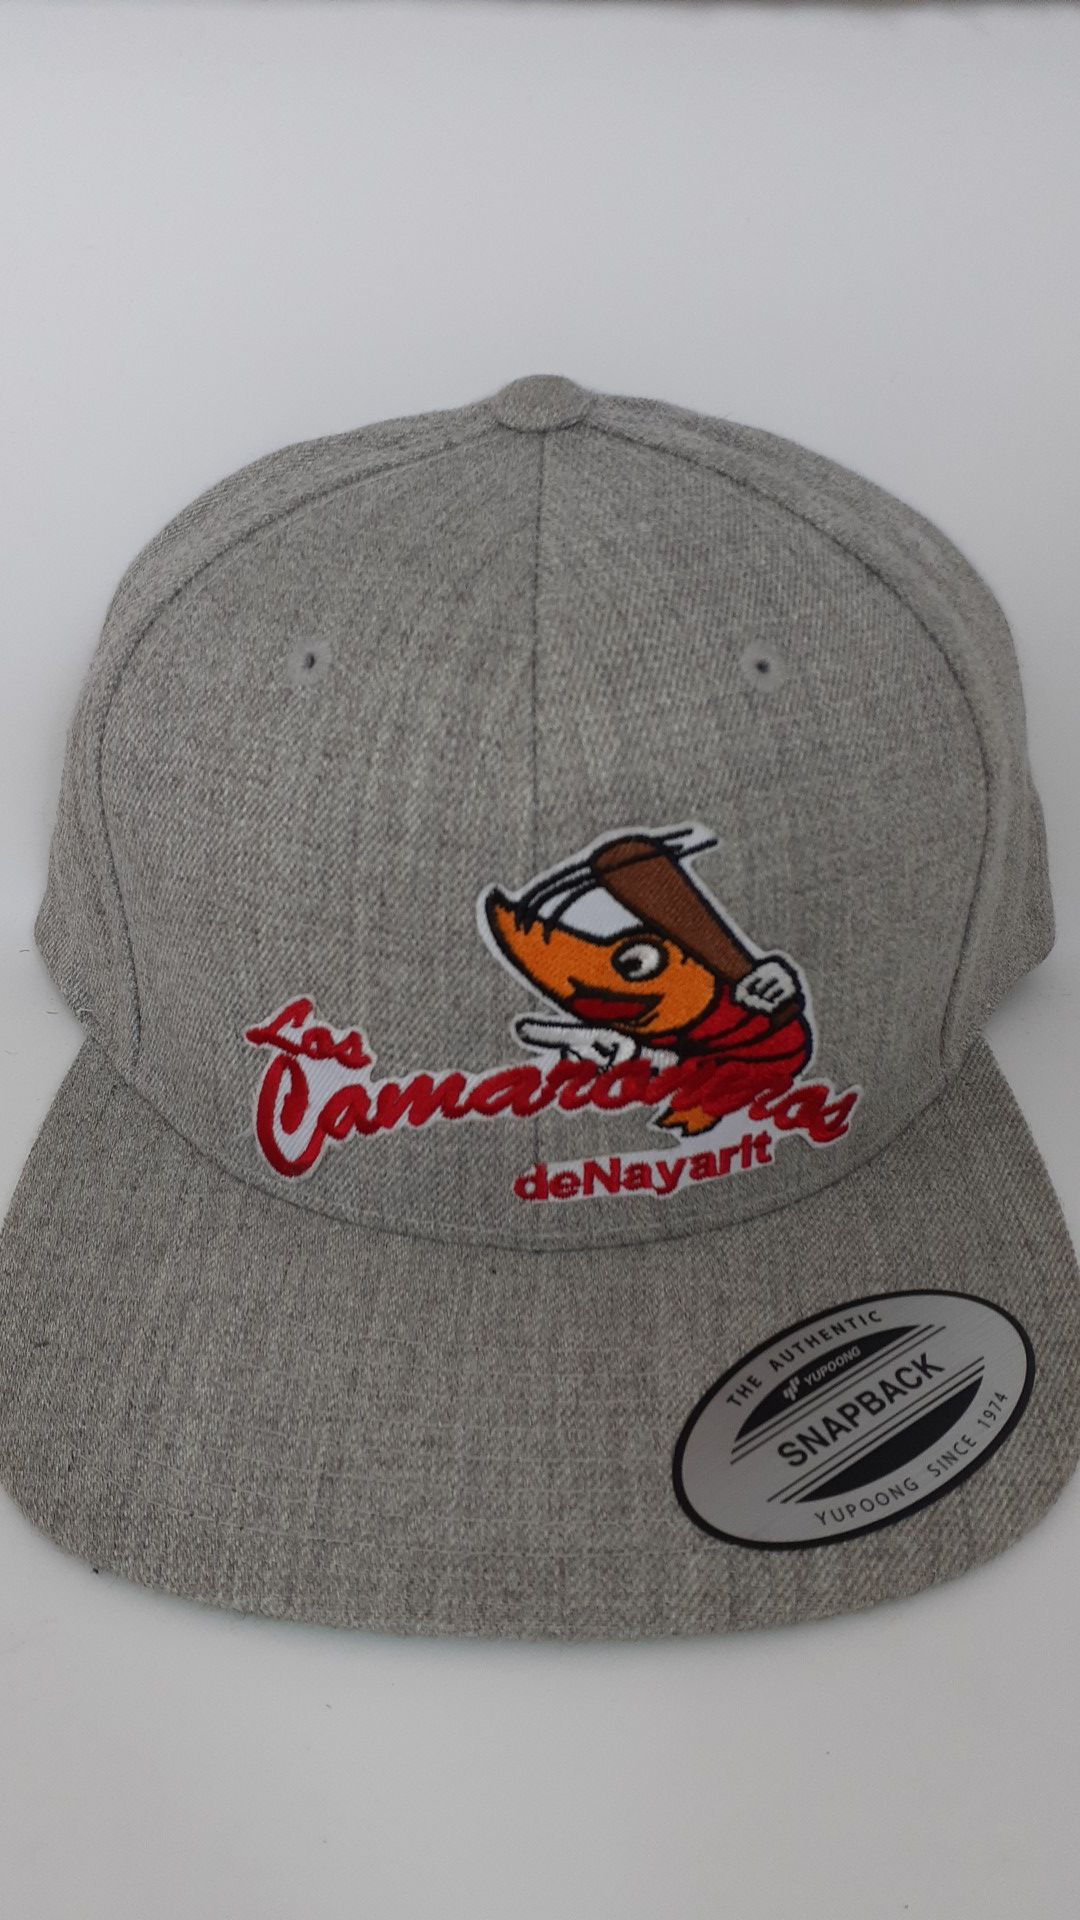 Gorras 🧢 de Nayarit Mexico 🇲🇽 snapback hats